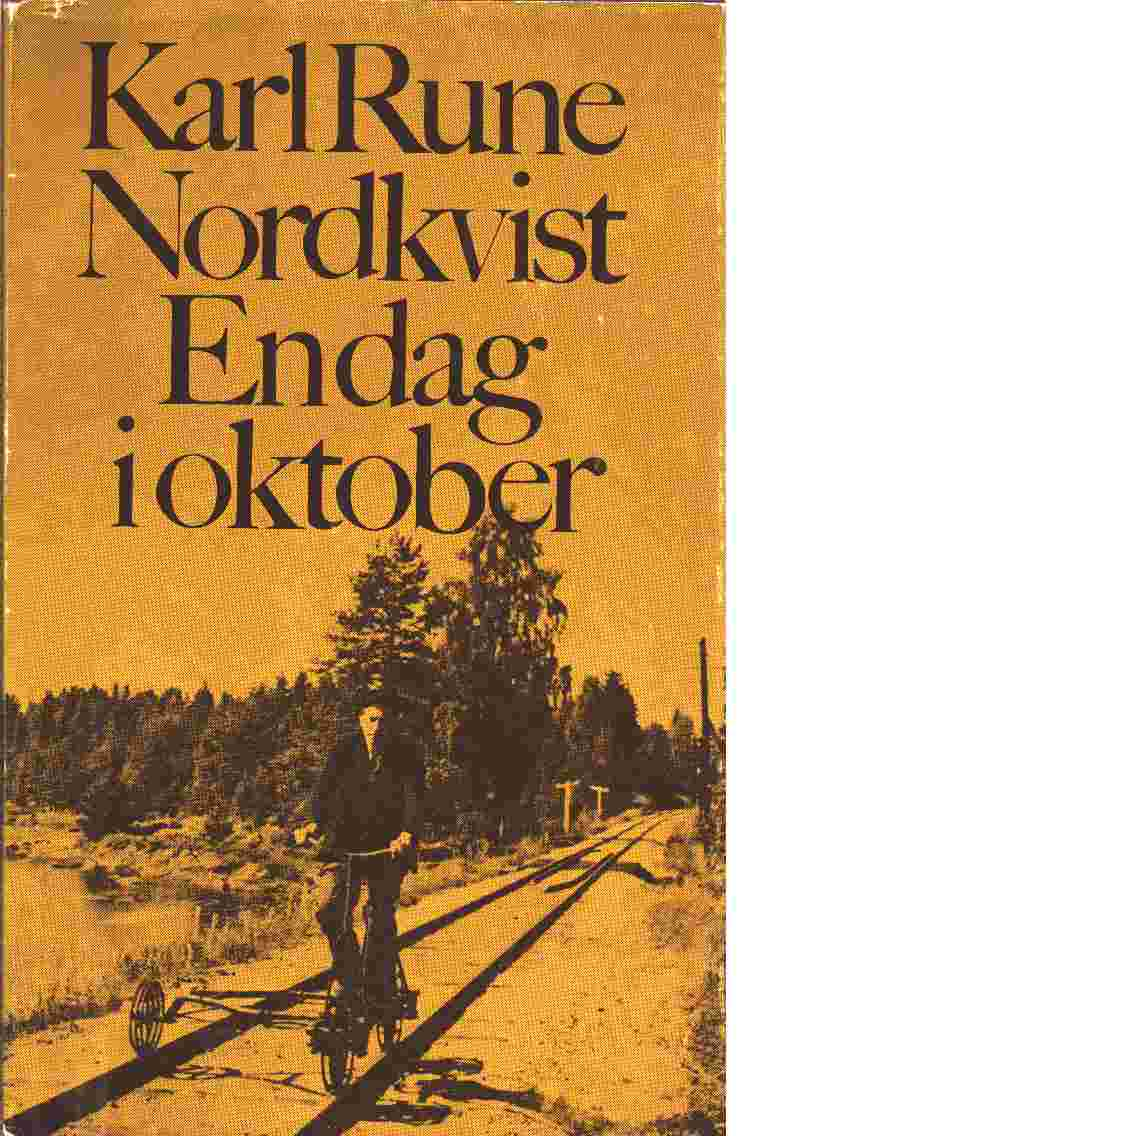 En dag i oktober - Nordkvist, Karl Rune